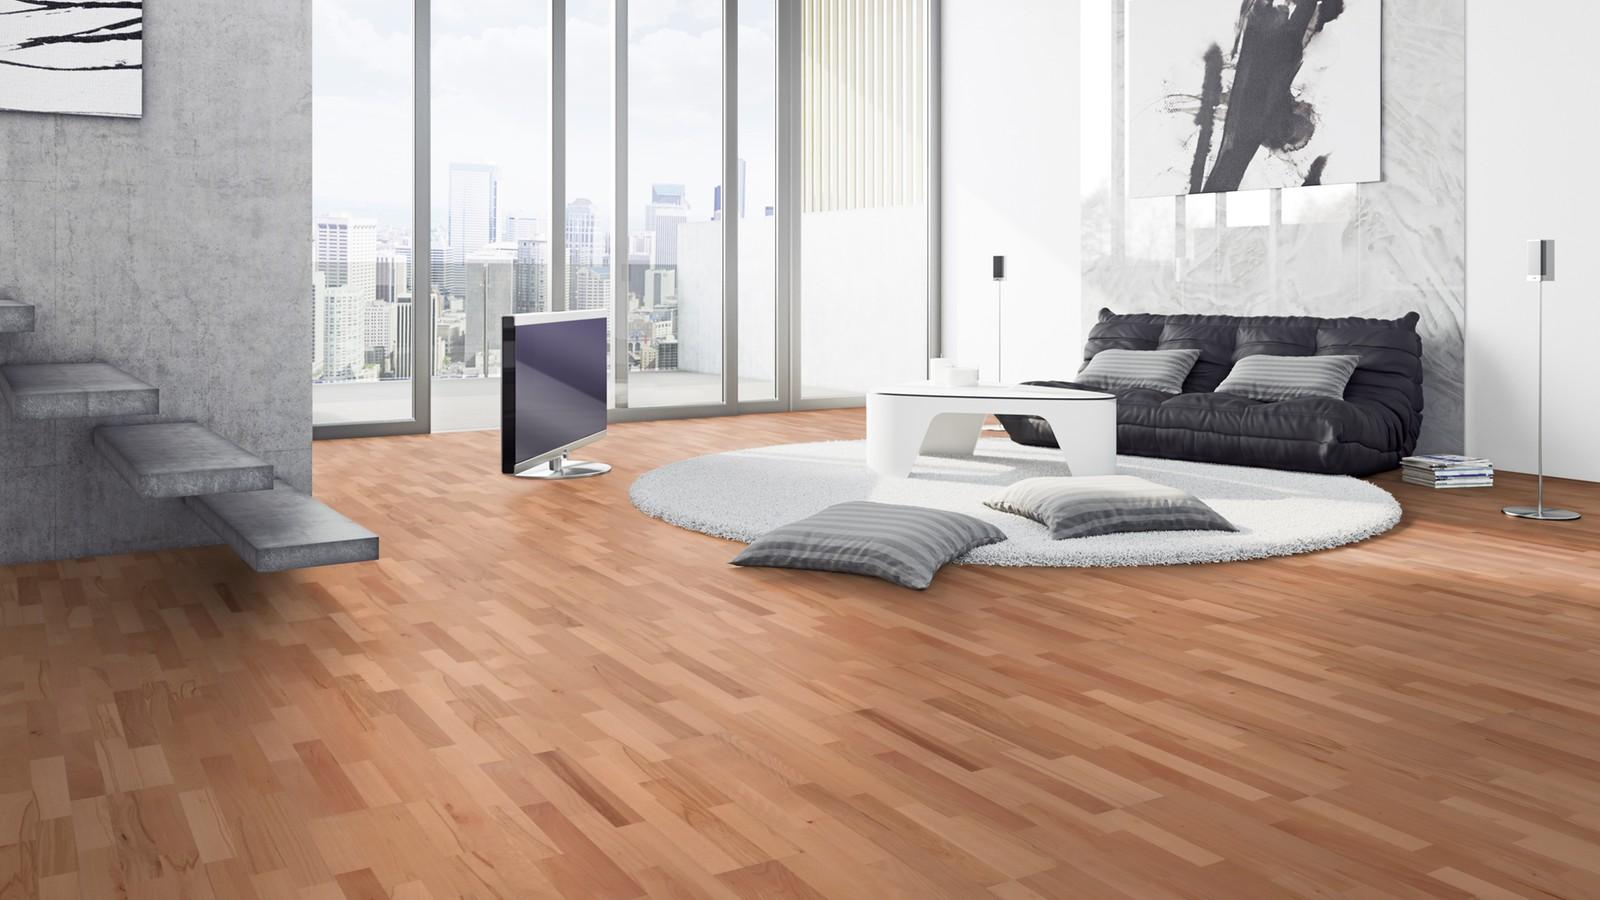 ter h rne sensual collection l parkett l c06 buche l schiffsboden preisbrecher. Black Bedroom Furniture Sets. Home Design Ideas